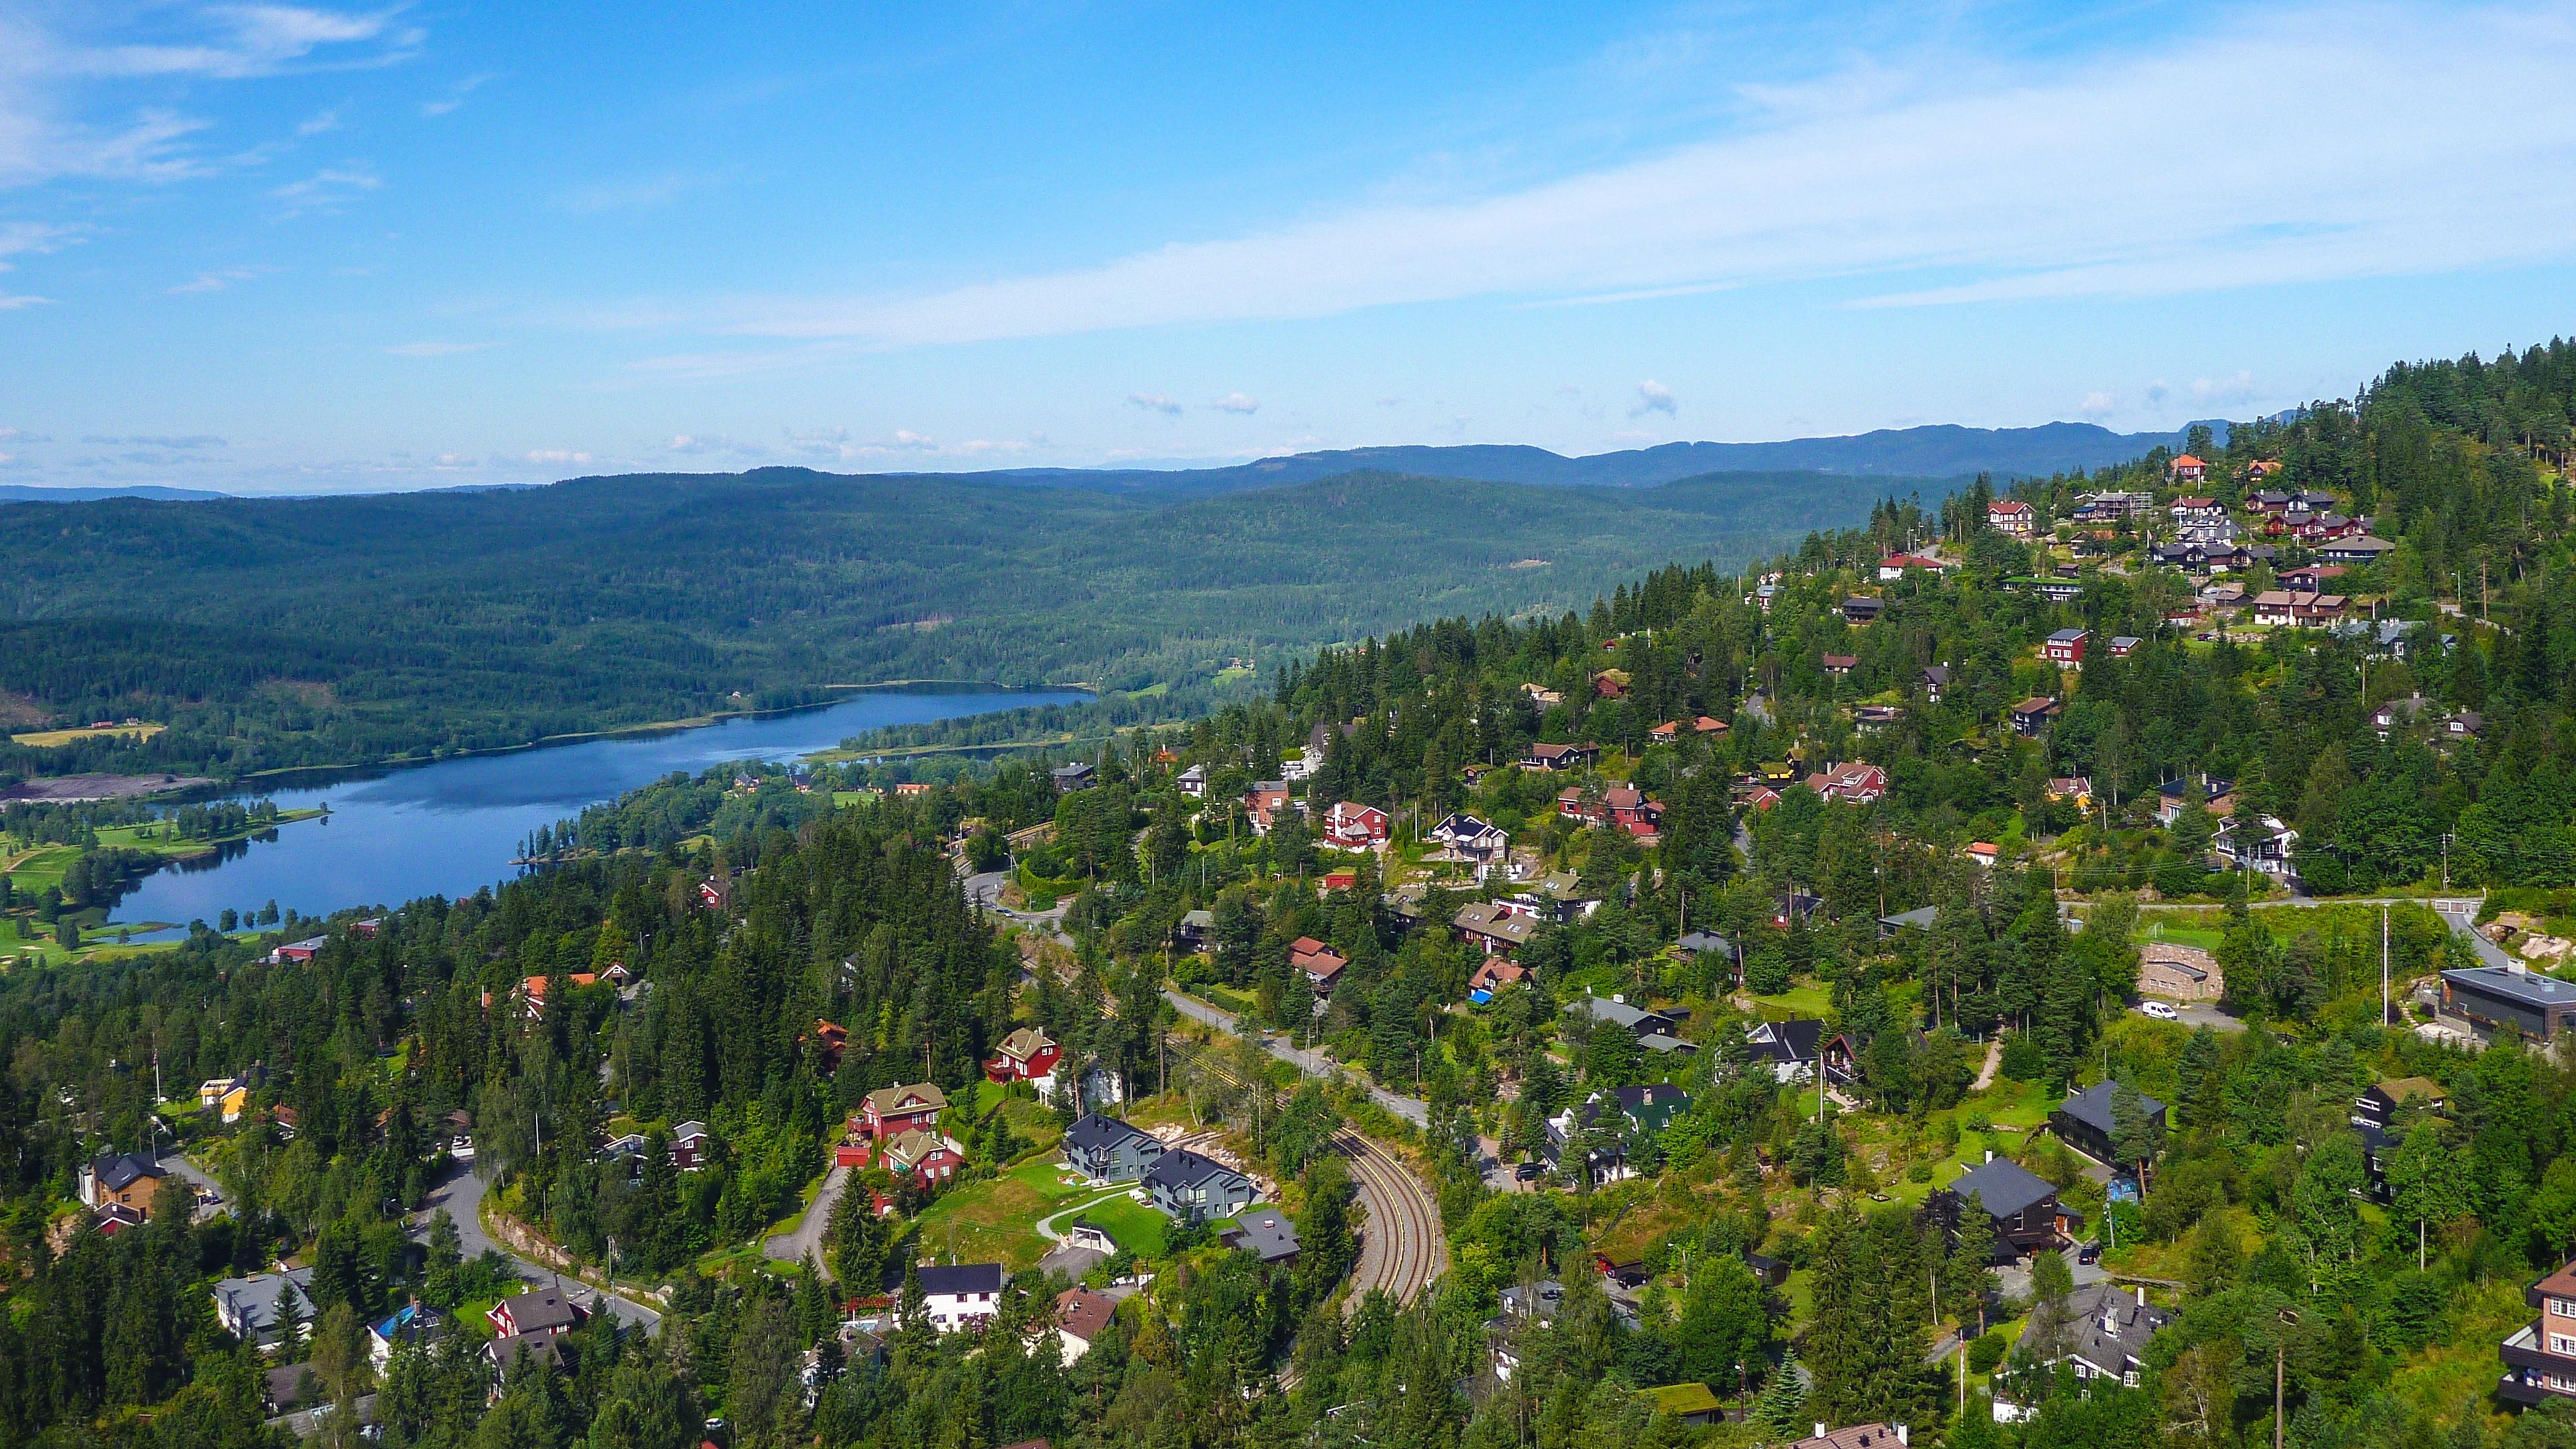 BOTPOST] Holmenkollen Oslo Norway [3840x2160] iimgurcom 3840x2160